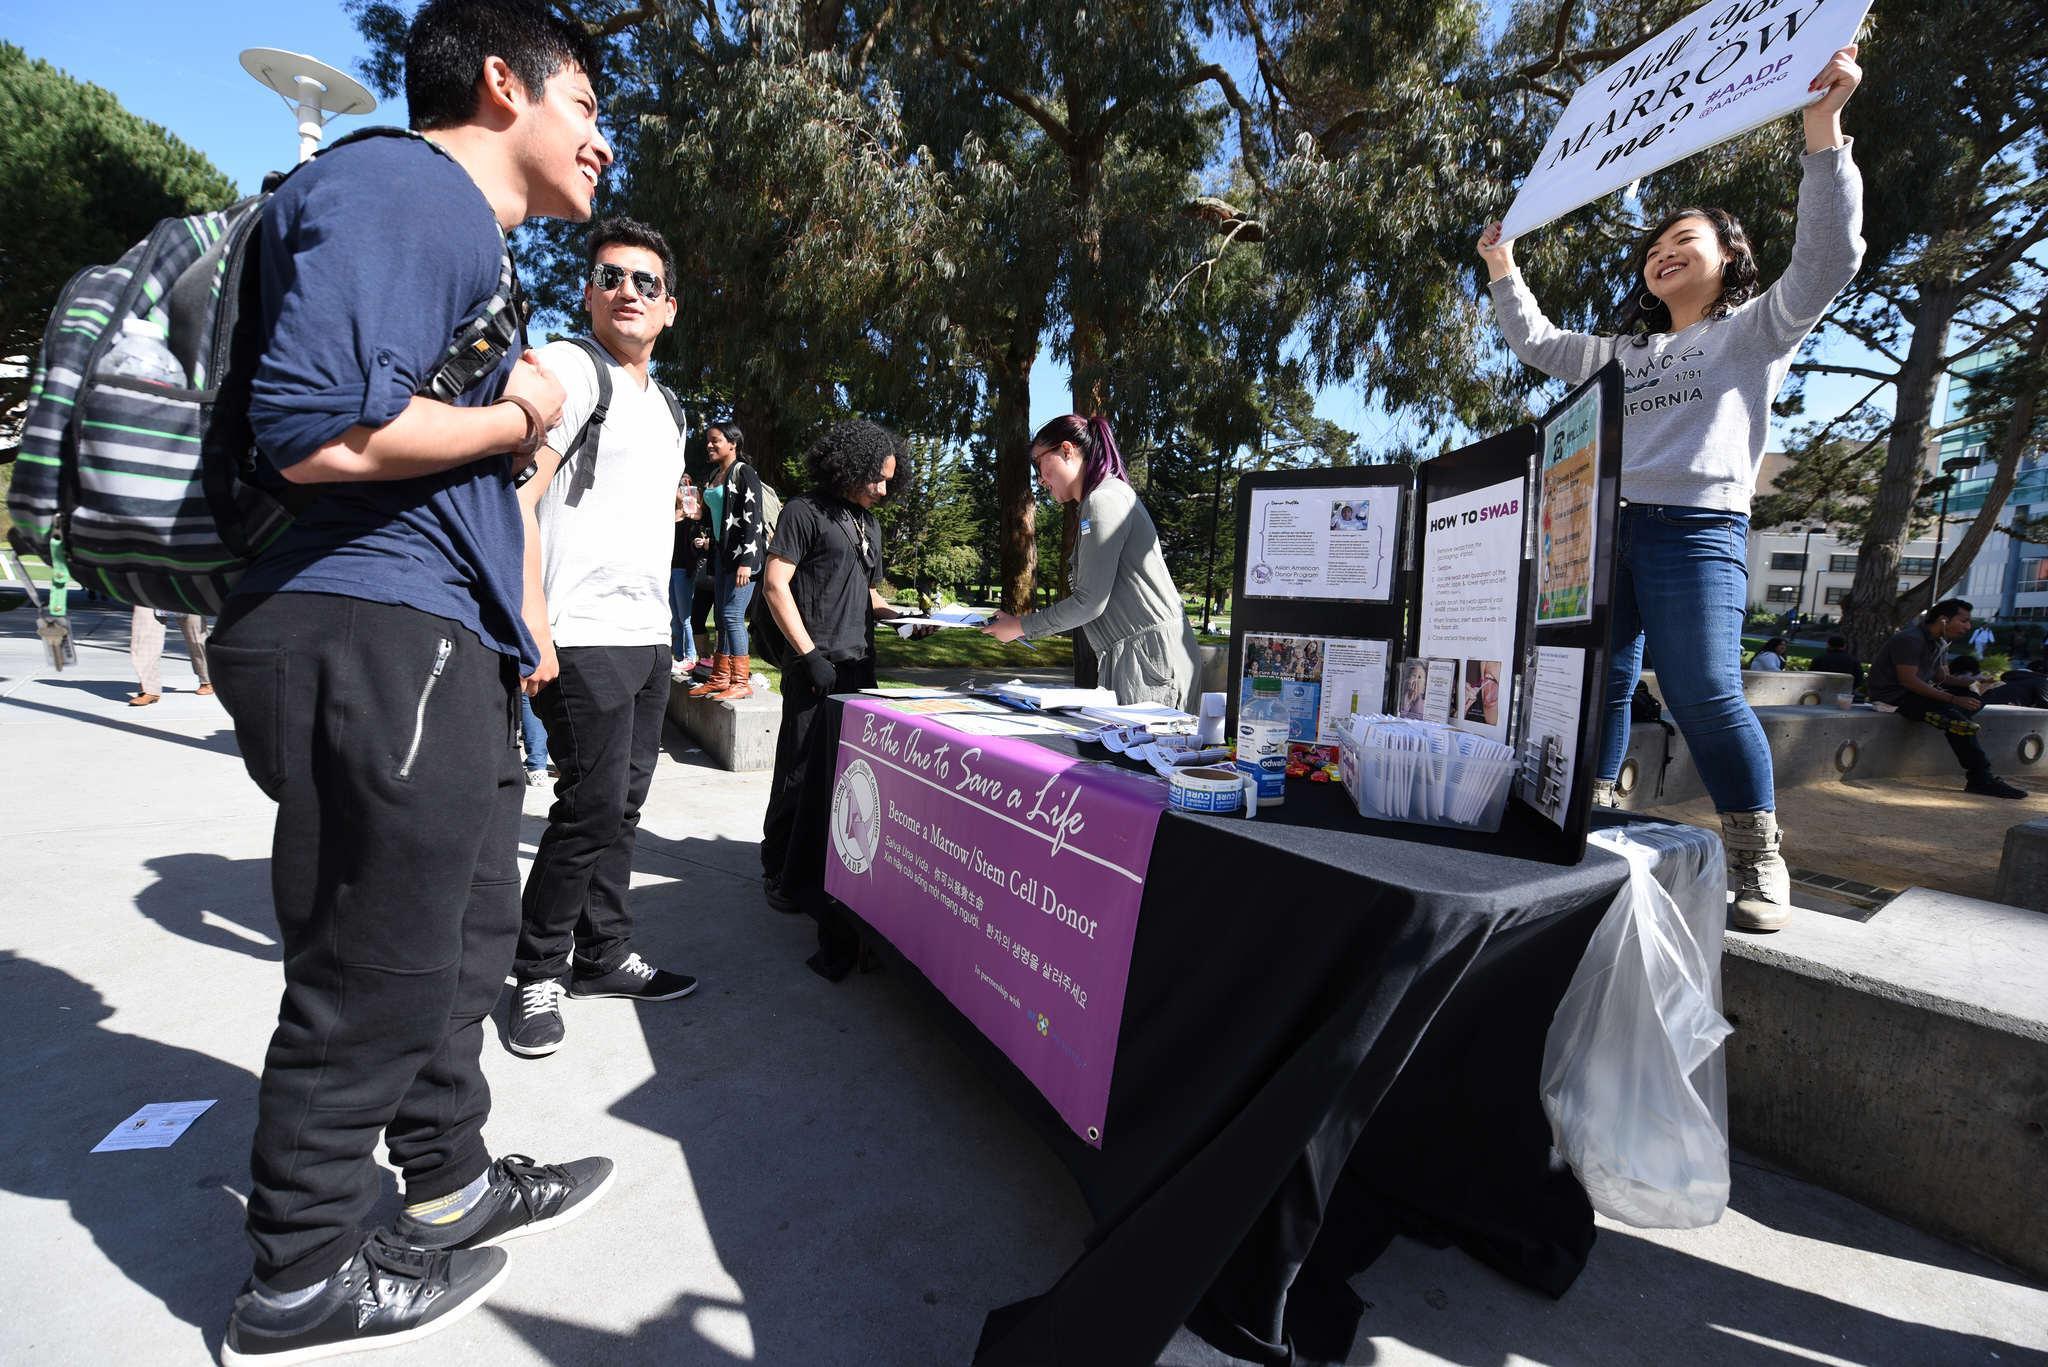 Mauricio Moreno, a junior, smiles at a sign held by Megan Chen saying